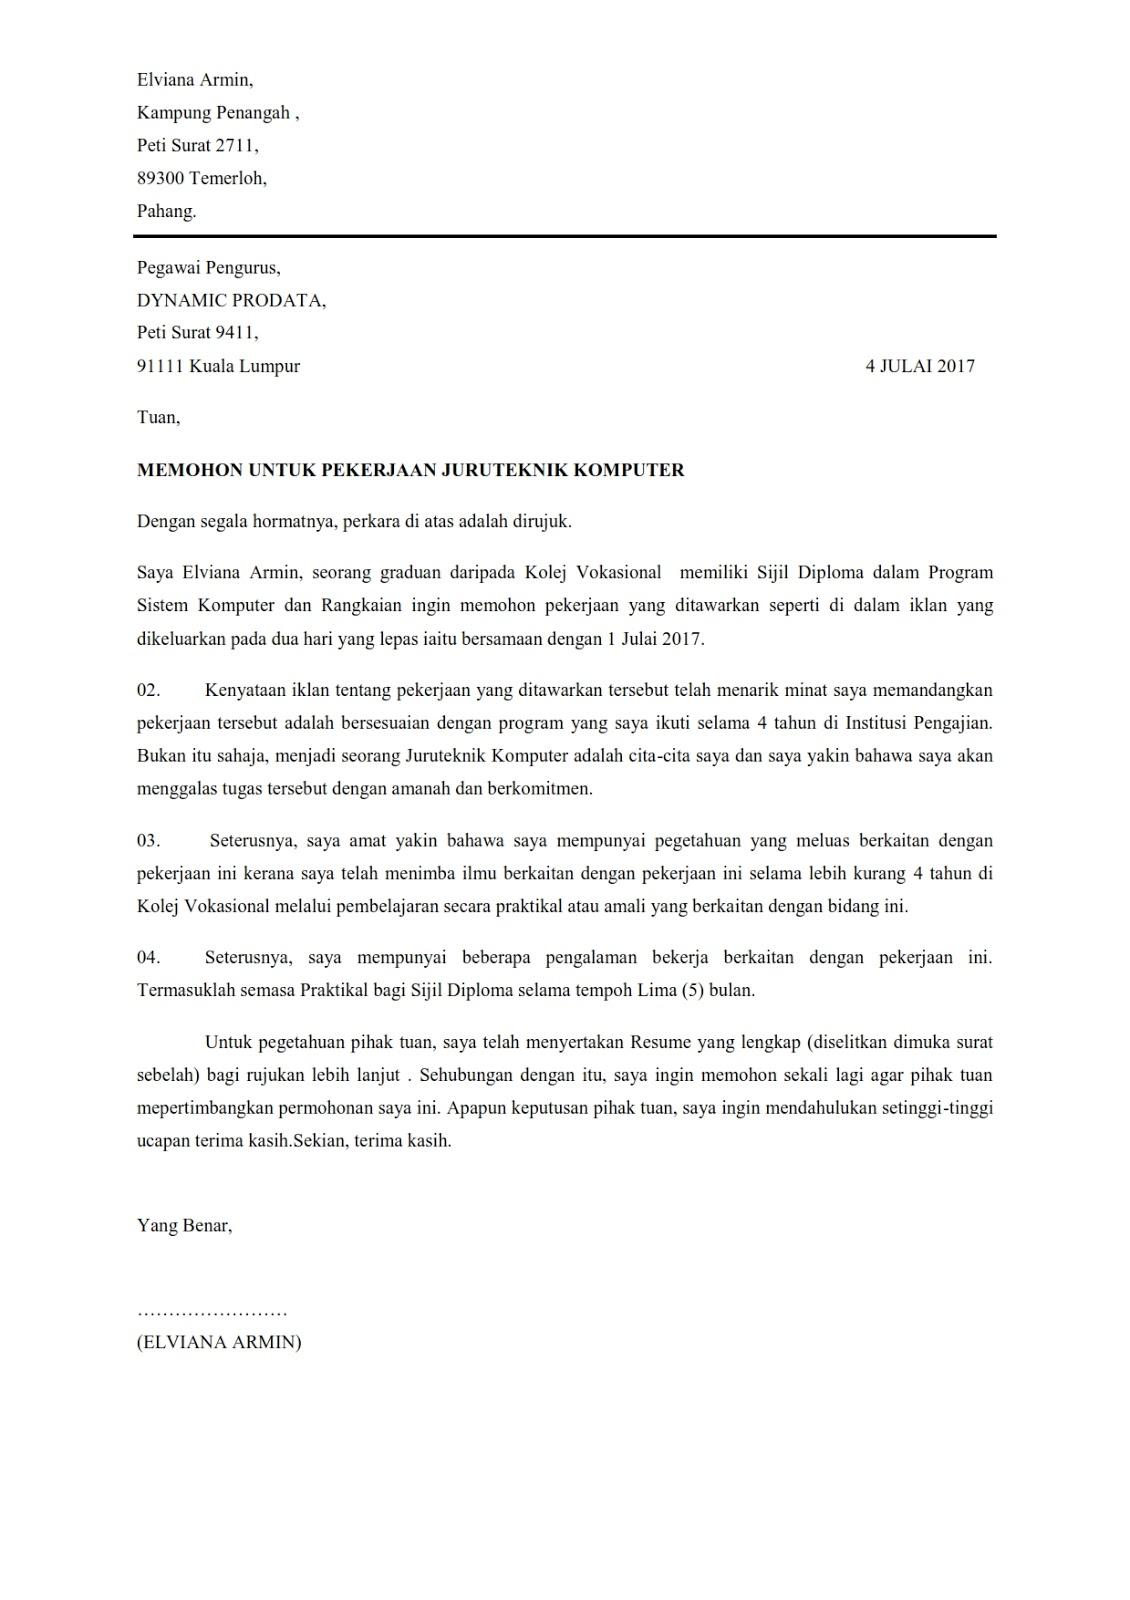 Surat Permohonan Kerja Kosong